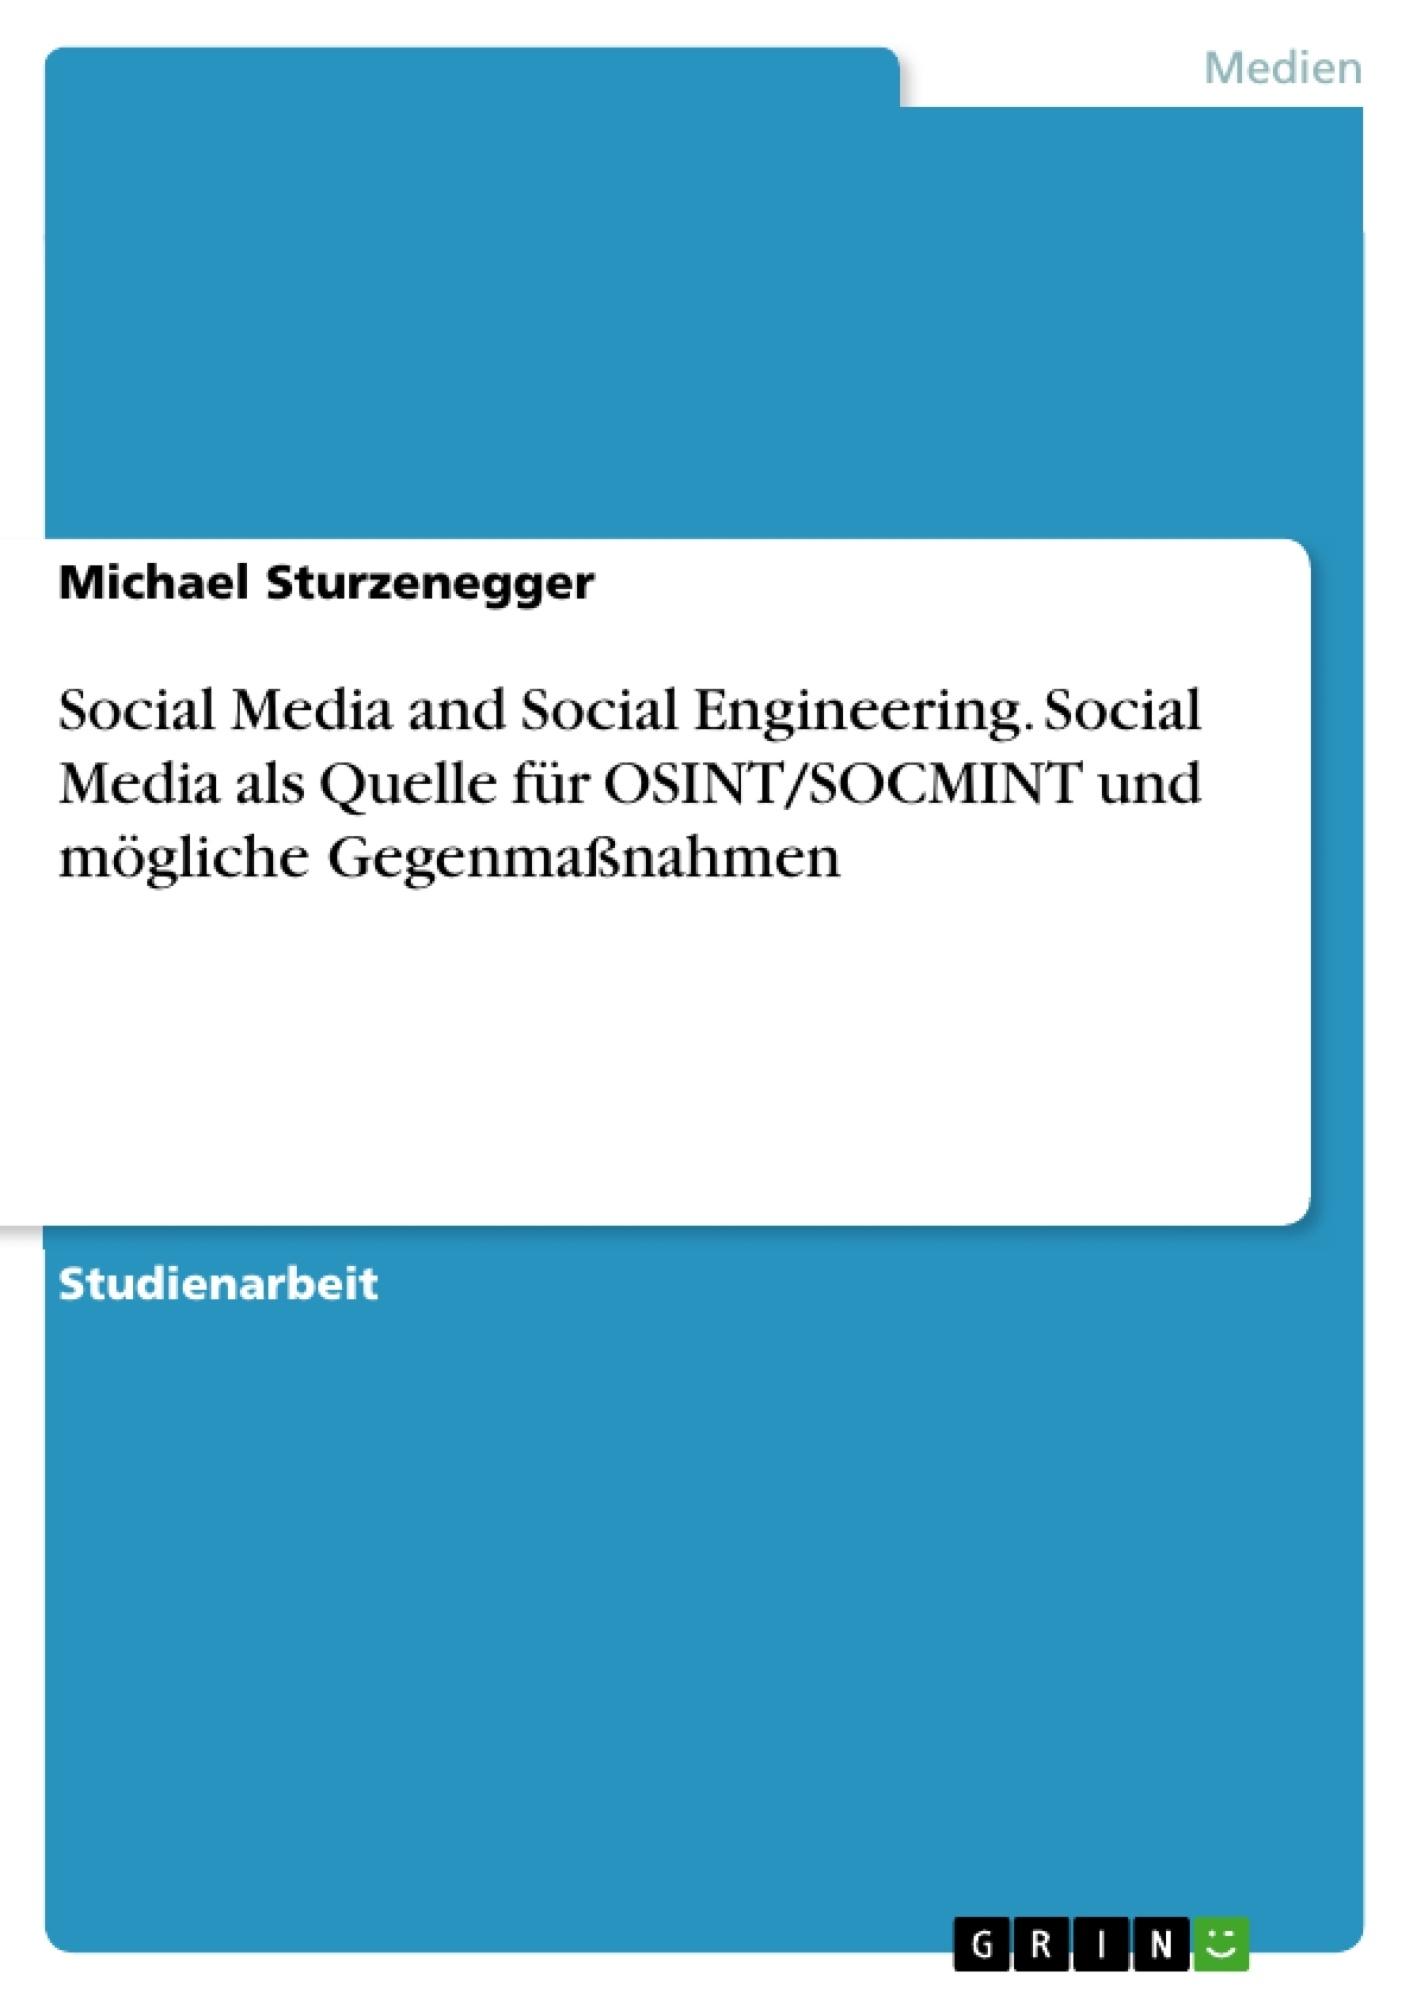 Titel: Social Media and Social Engineering. Social Media als Quelle für OSINT/SOCMINT und mögliche Gegenmaßnahmen